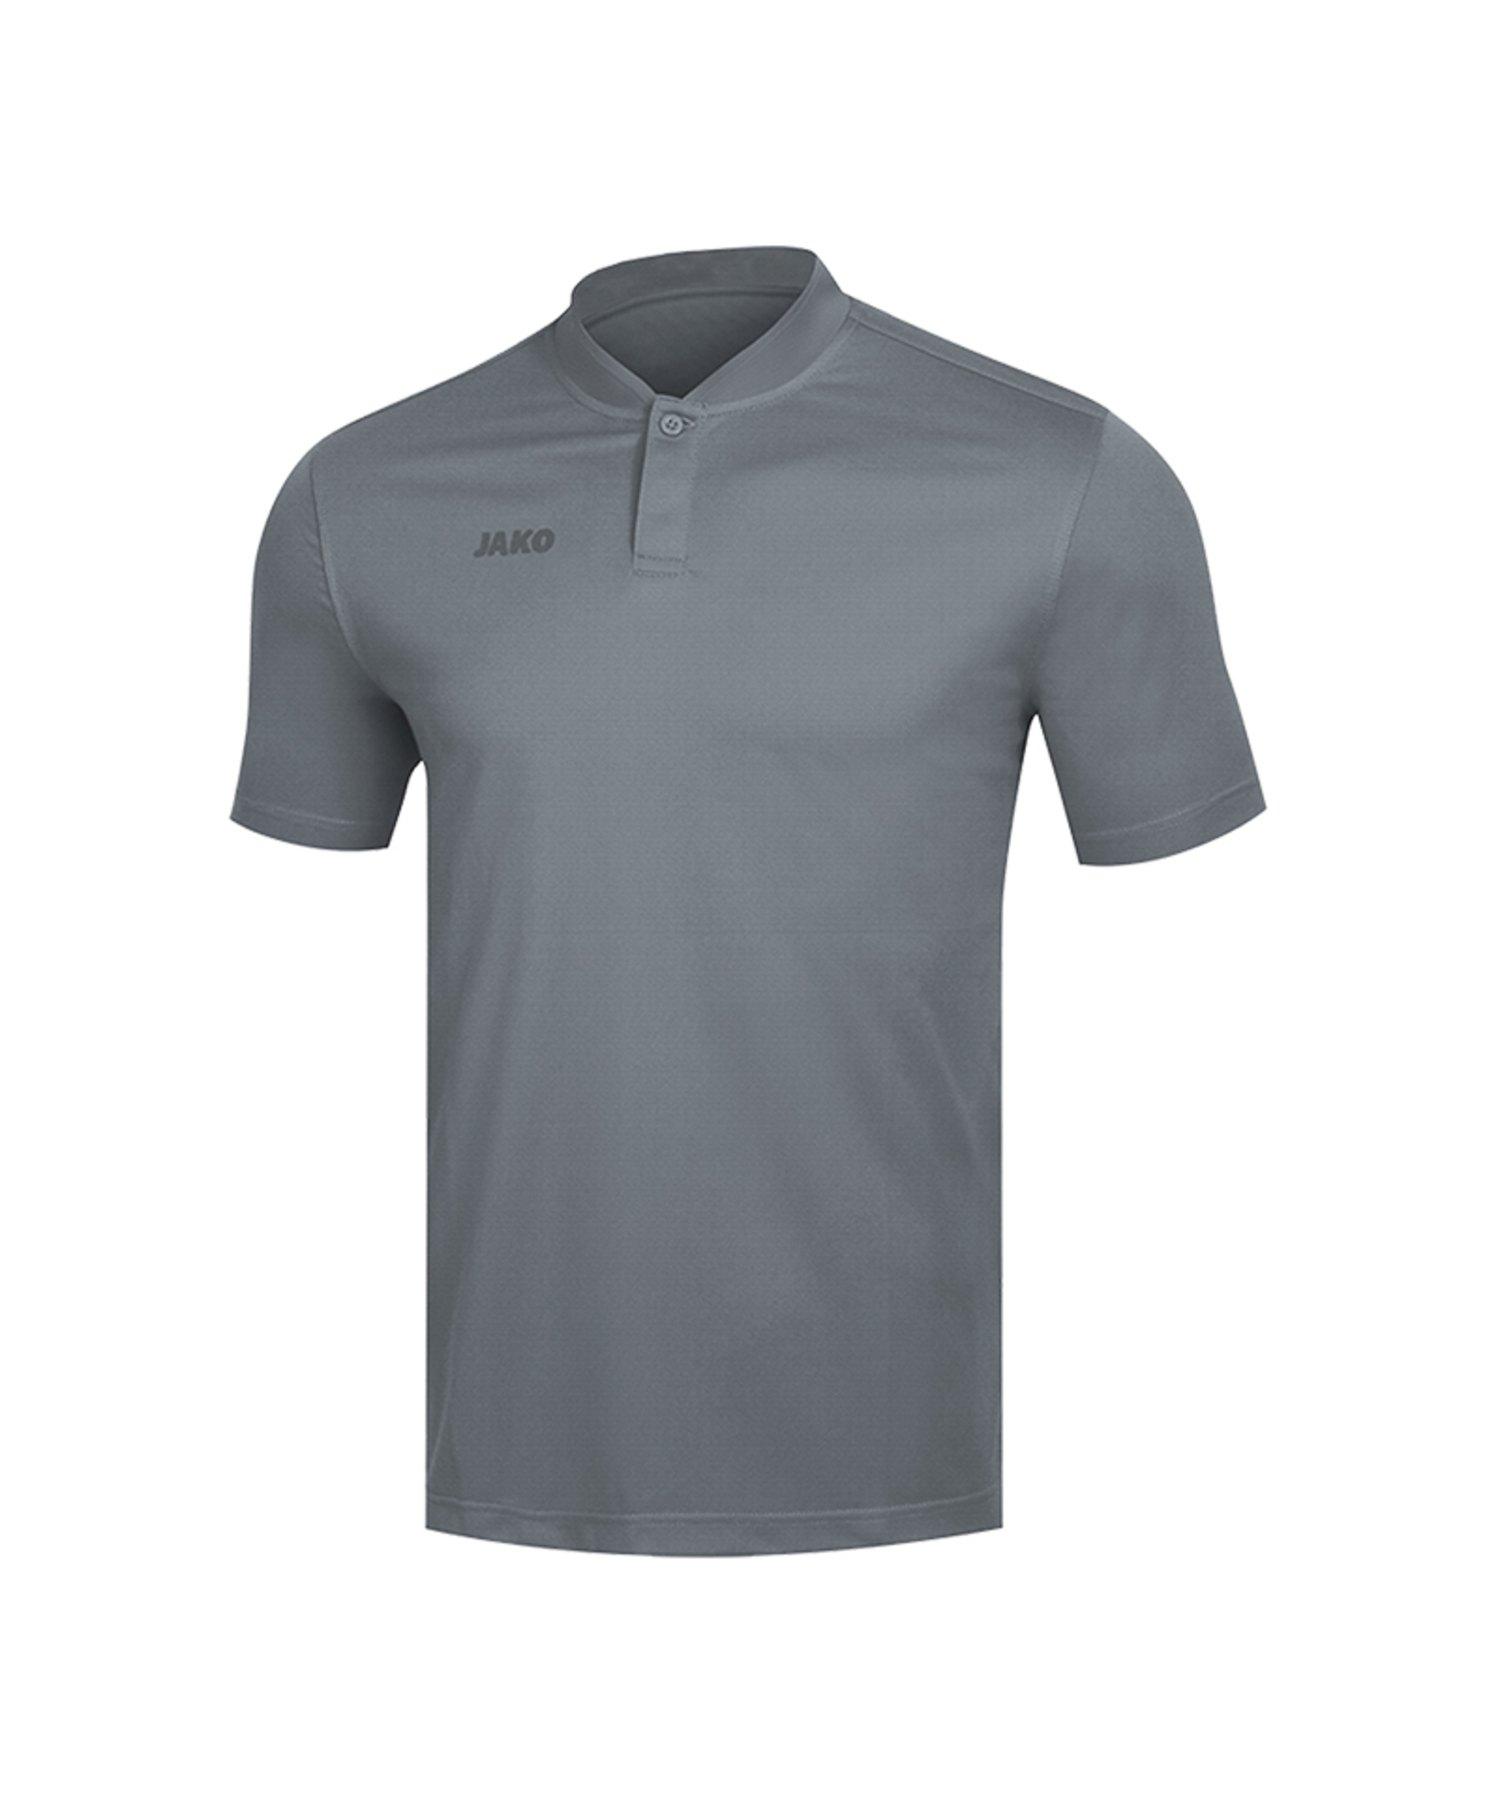 Jako Prestige Poloshirt Damen Grau F40 - Grau